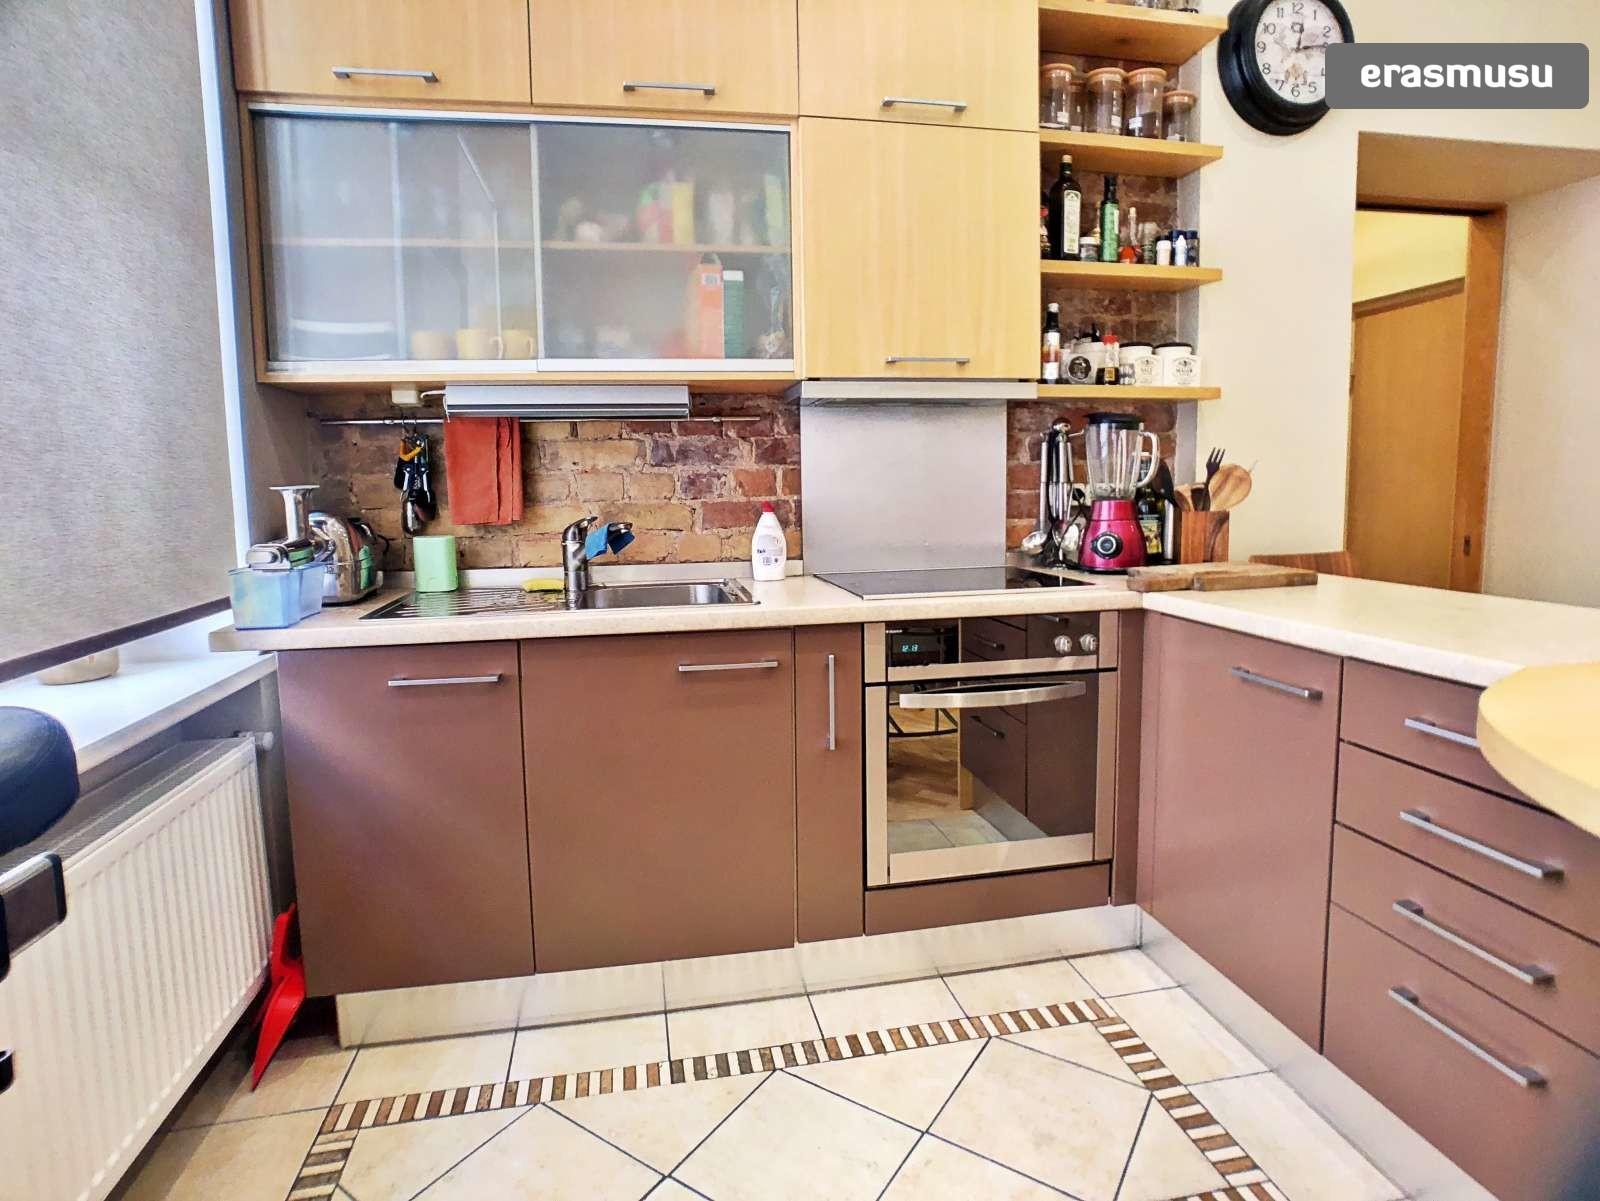 modern-1-bedroom-apartment-rent-centrs-3de0bb6df89e9e934251c87ed